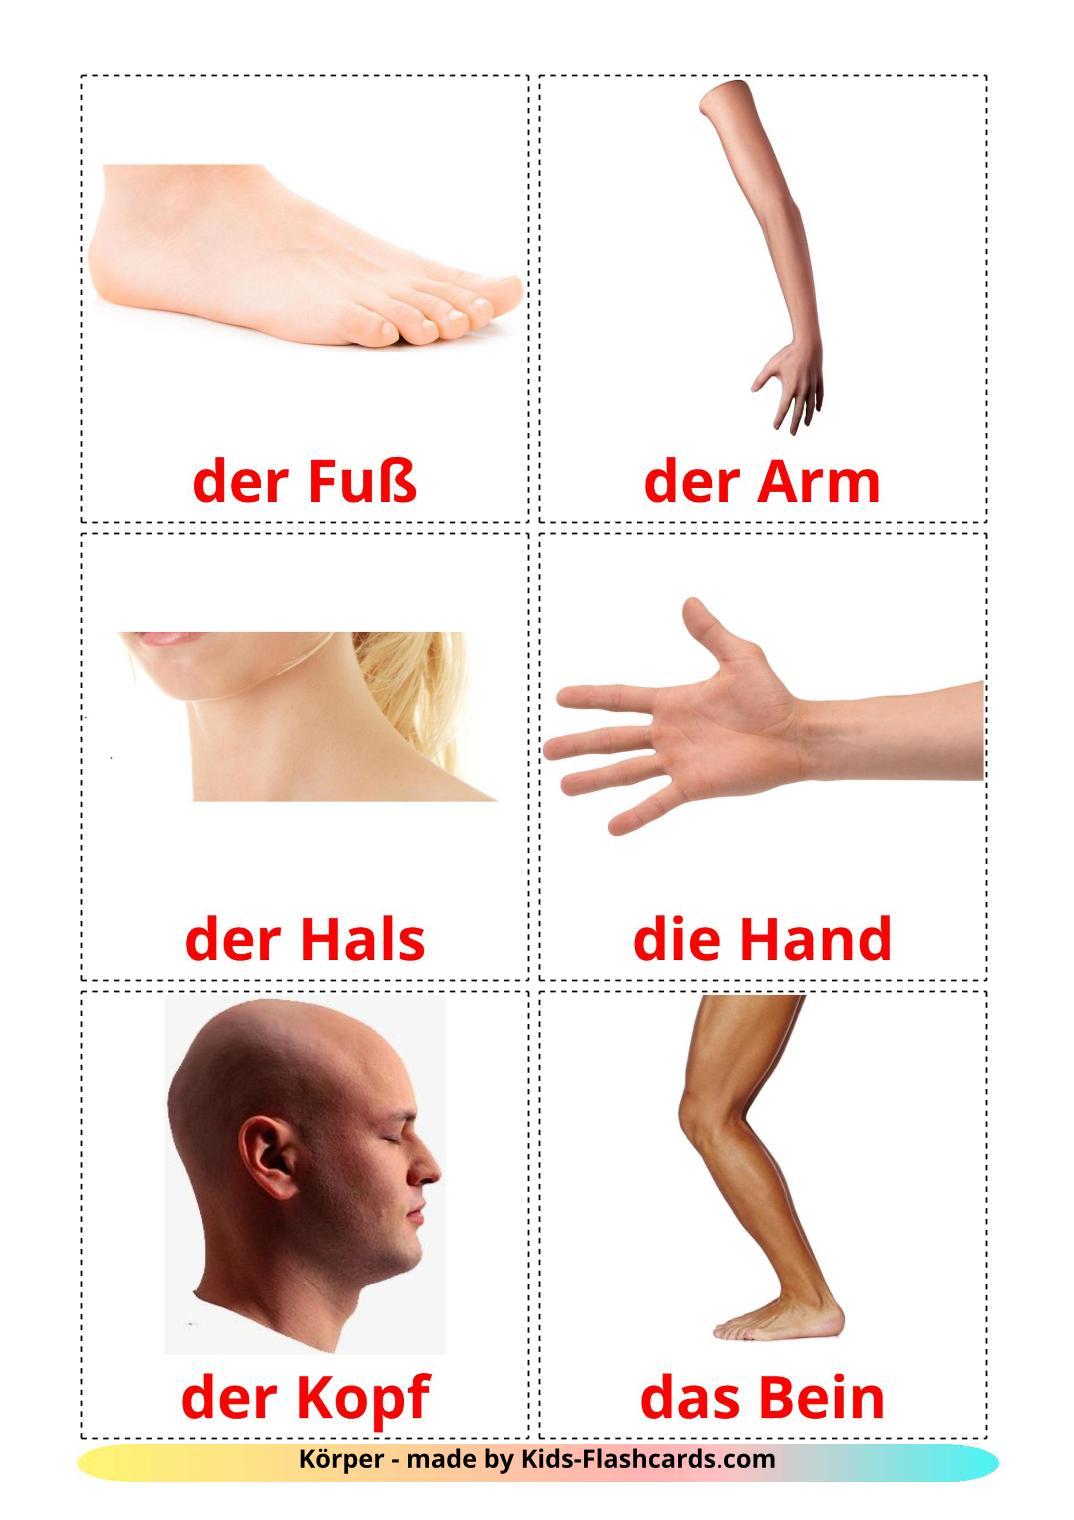 Body Parts - 26 Free Printable german Flashcards